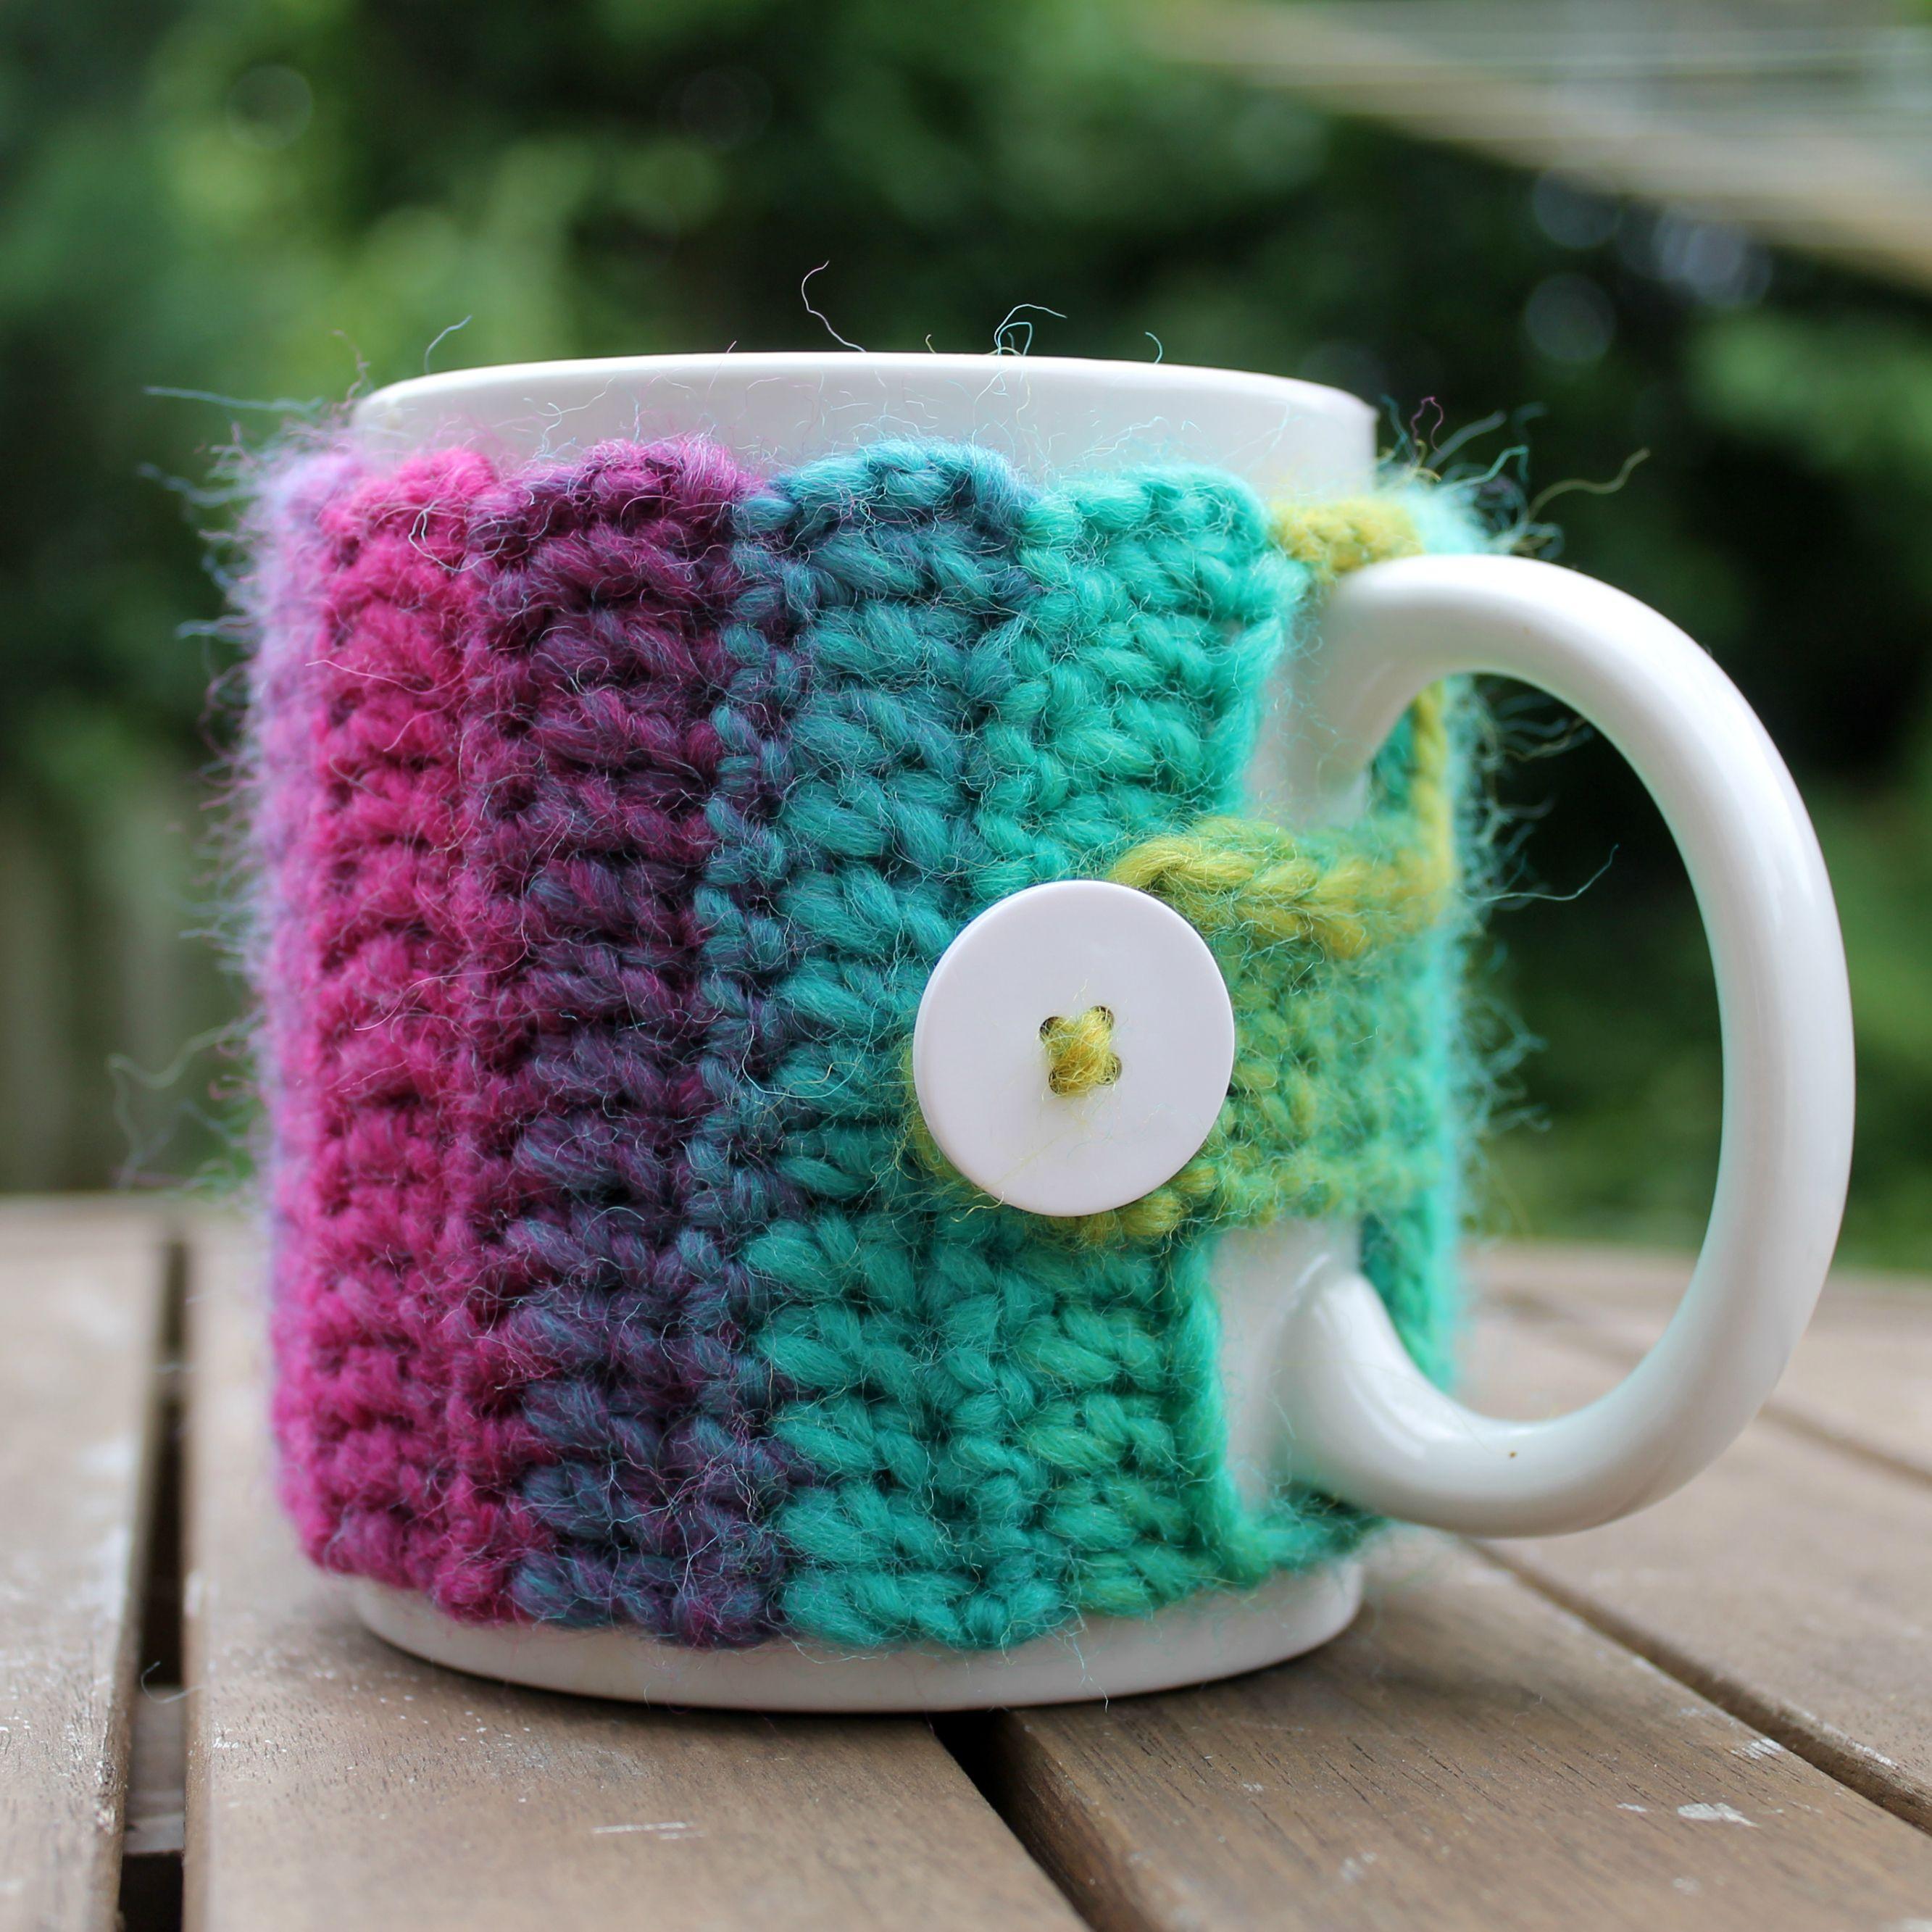 Rainbow cozy cozy crochet and coffee cozy mug cozy bankloansurffo Images